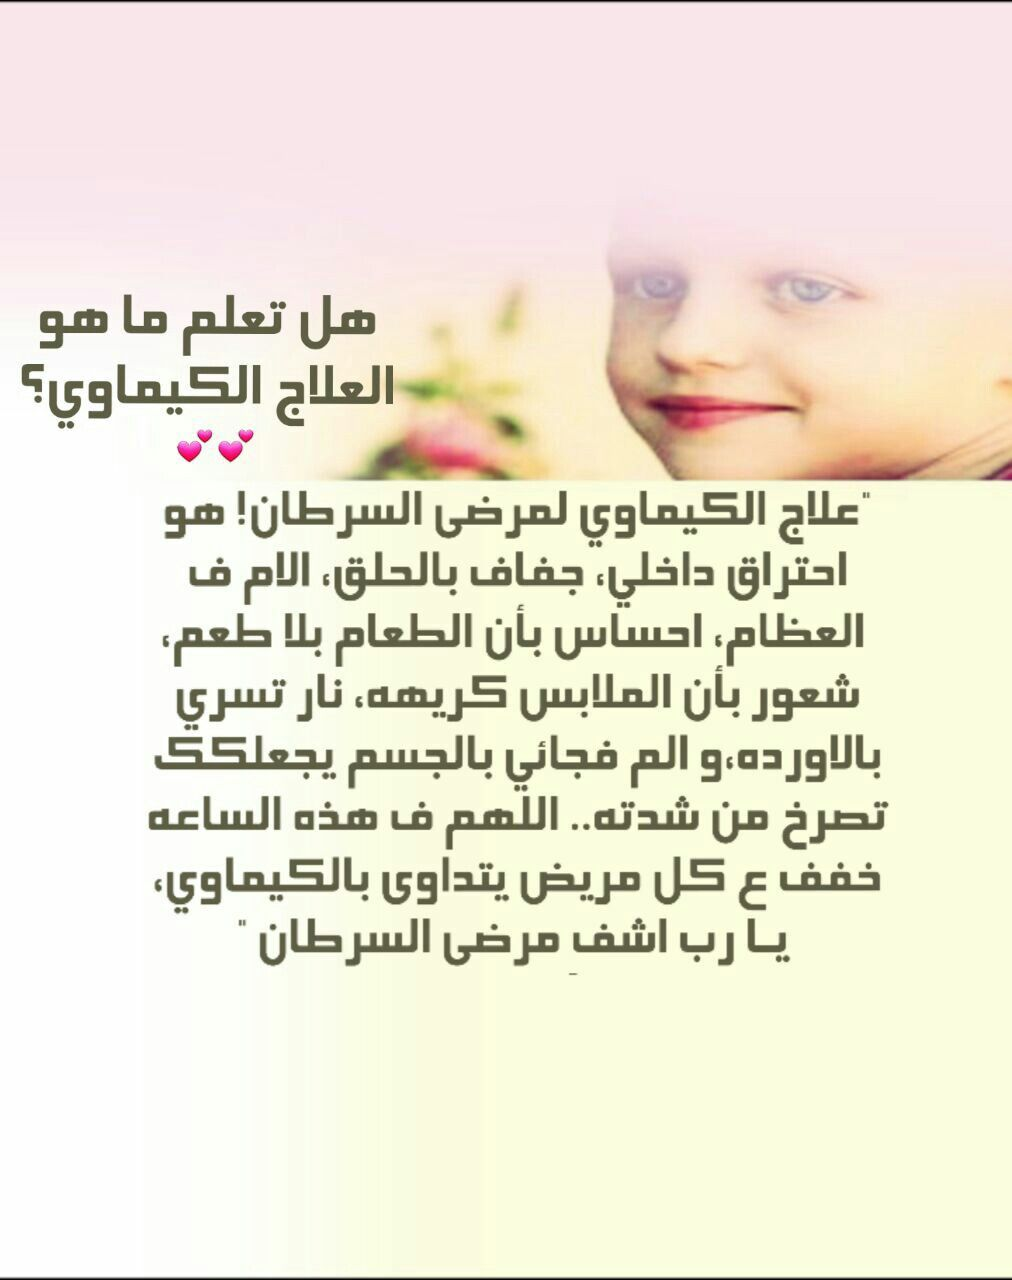 اللهم اشف كل مريض بالسطان Movie Posters Movies Poster